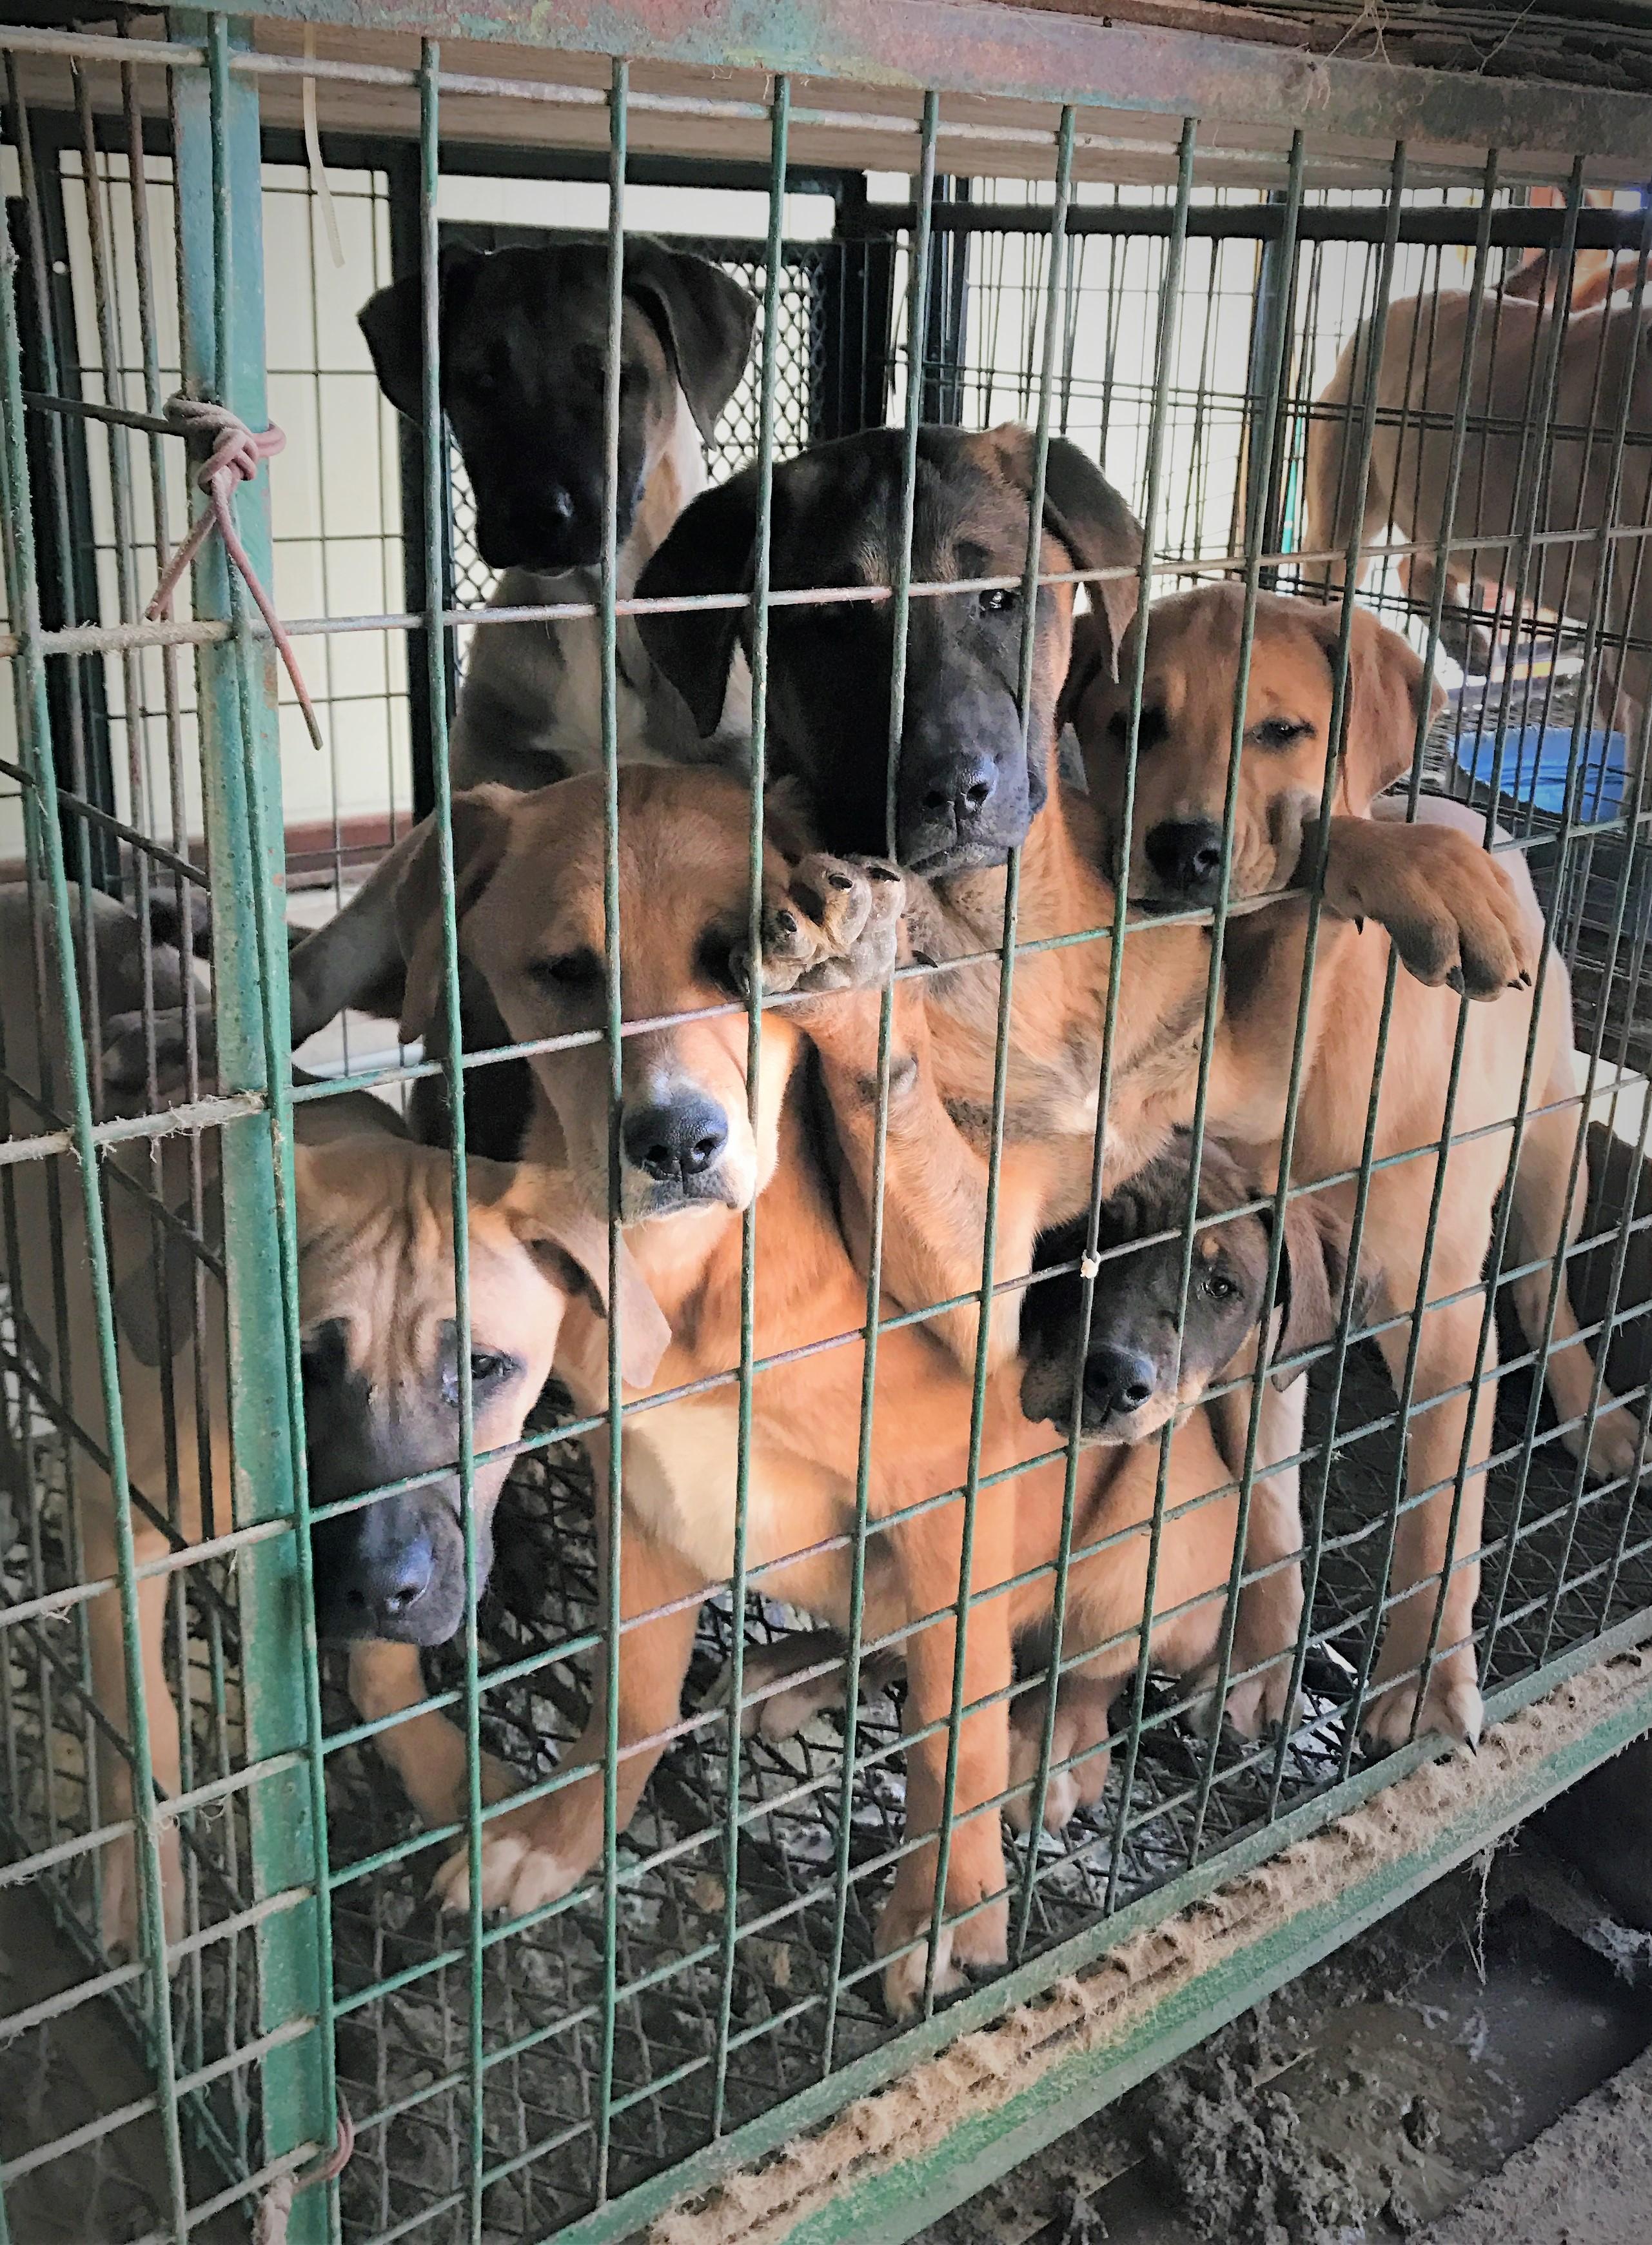 SaveKoreanDogs need your partnership to save the Korean dogs.